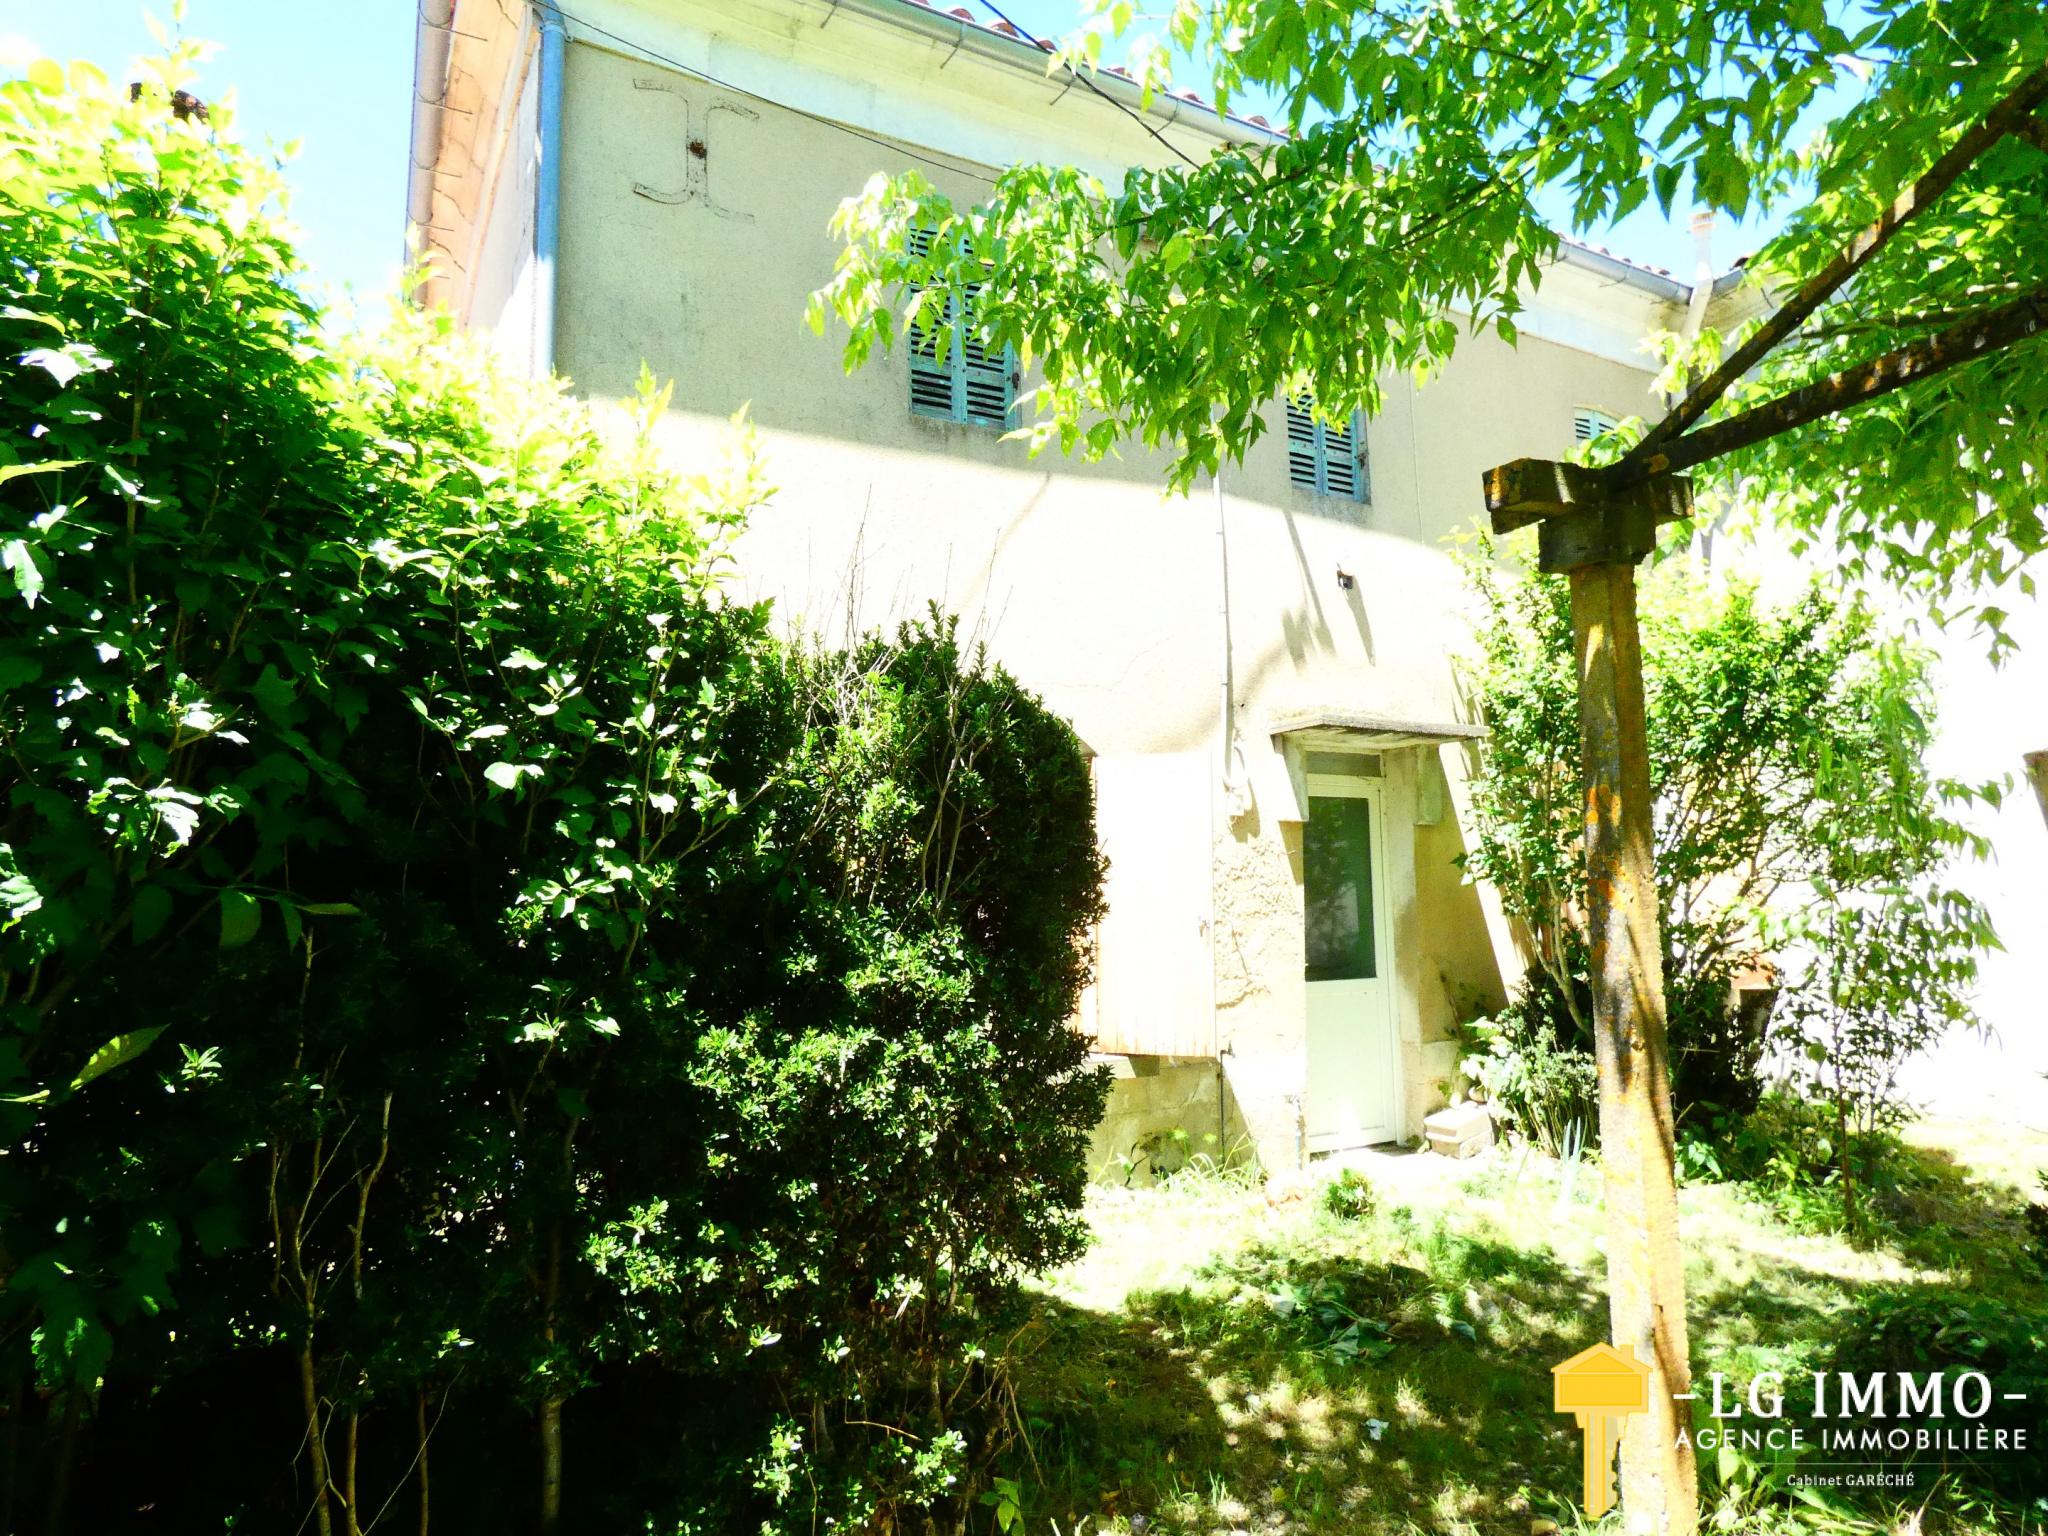 Vente Maison 2 Pieces Mitoyenne Avec Jardin Non Clos At Abri